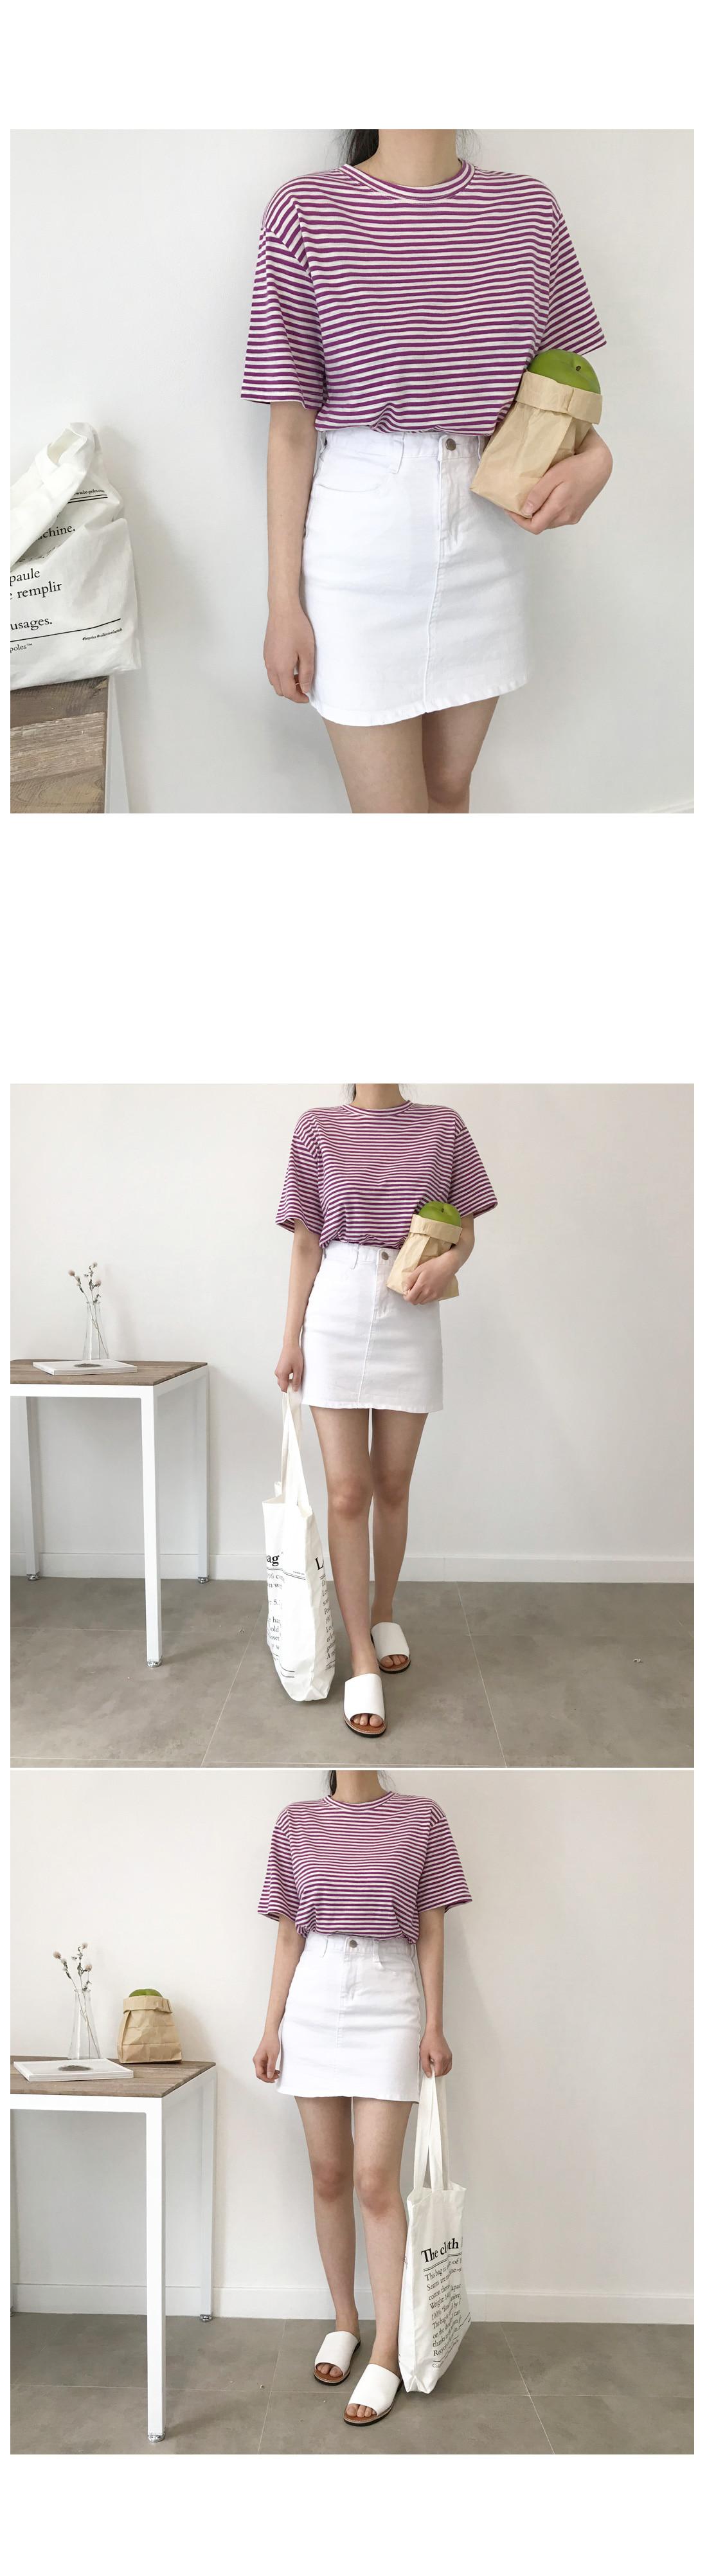 Lori mini skirt - White, Black M size ships same day